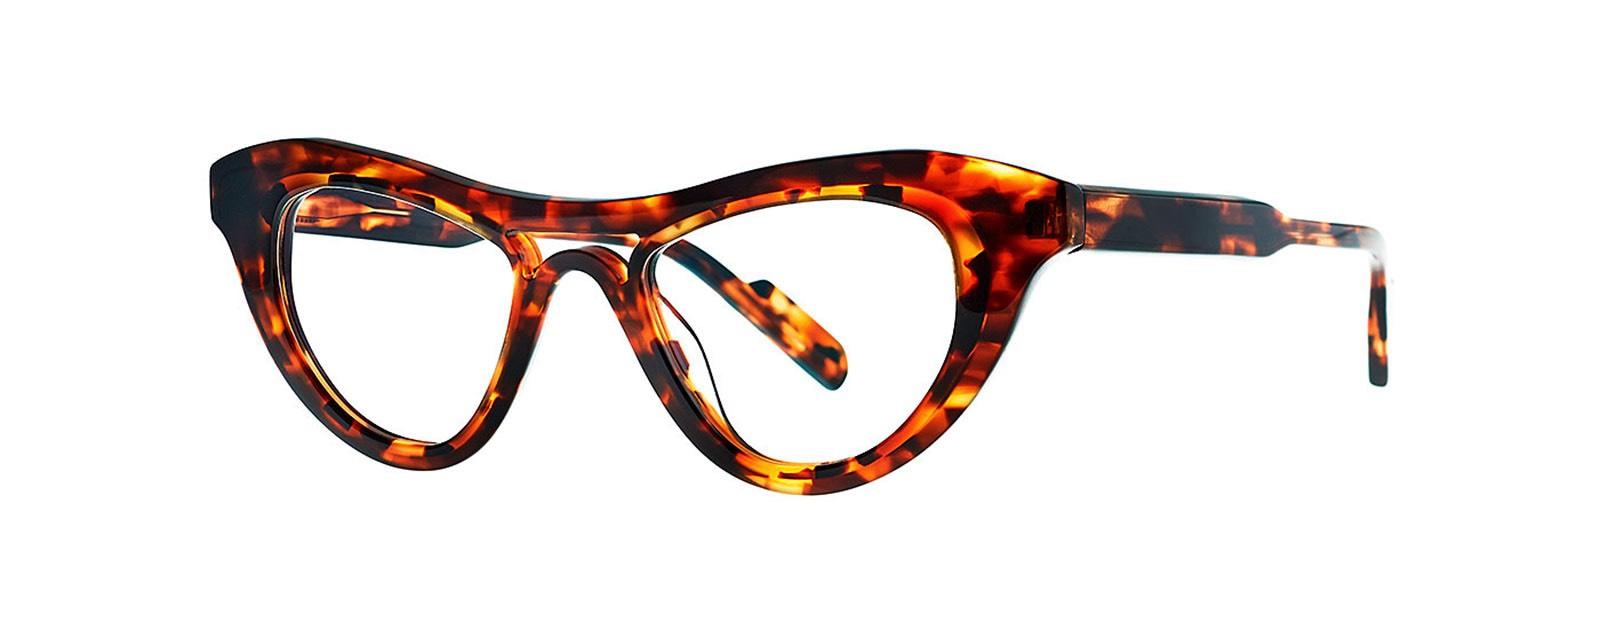 f405f960810 Theo-brillen-en-zonnebrillen -desserts-mille-feuille-010-brown-ecailhavana-ecail